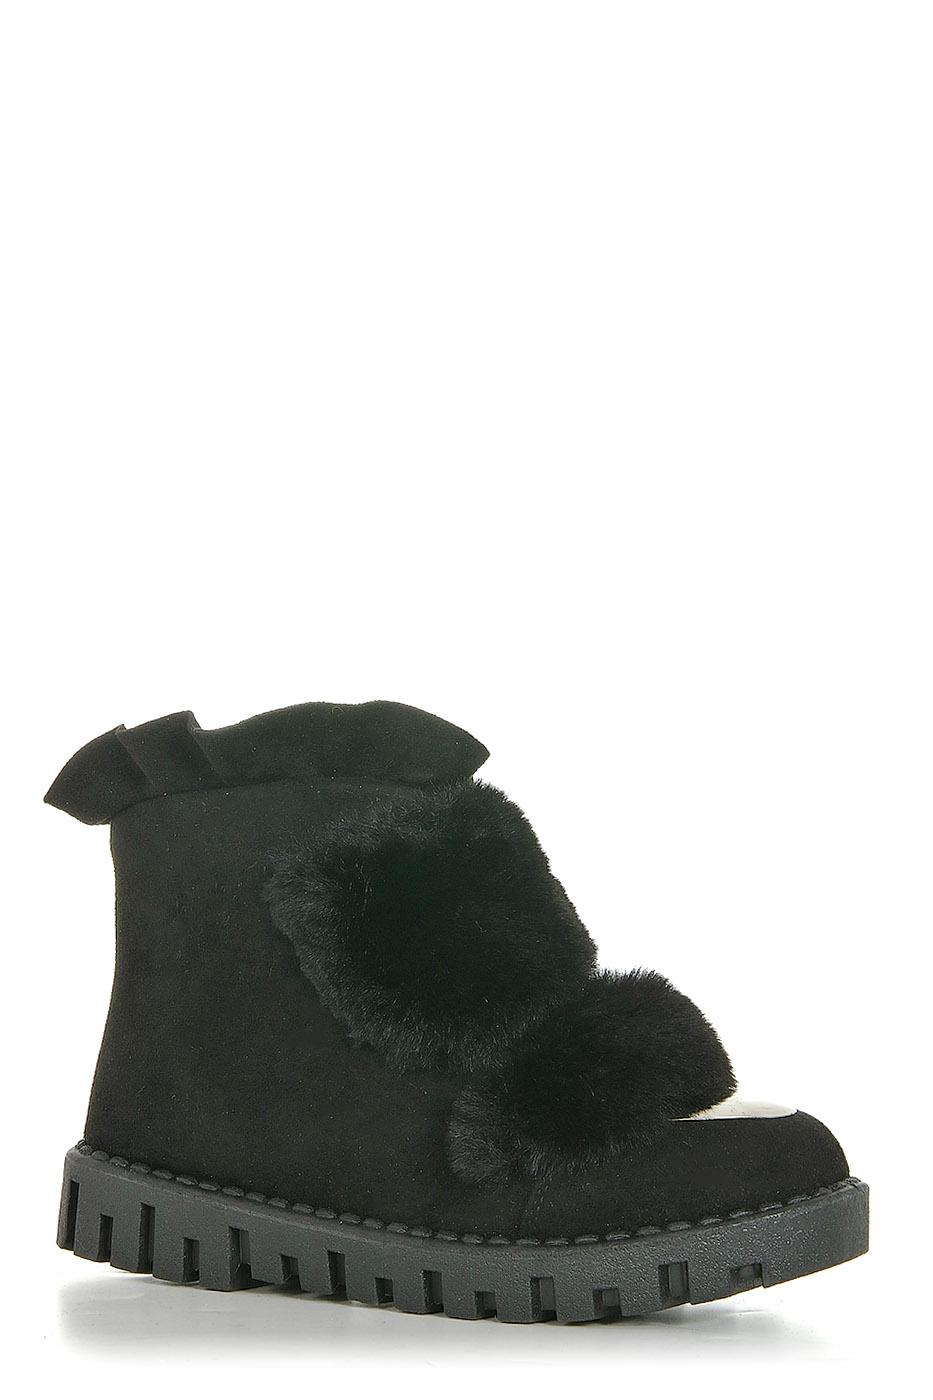 Ботинки TOPLAND2352-PB76267B/BLACK